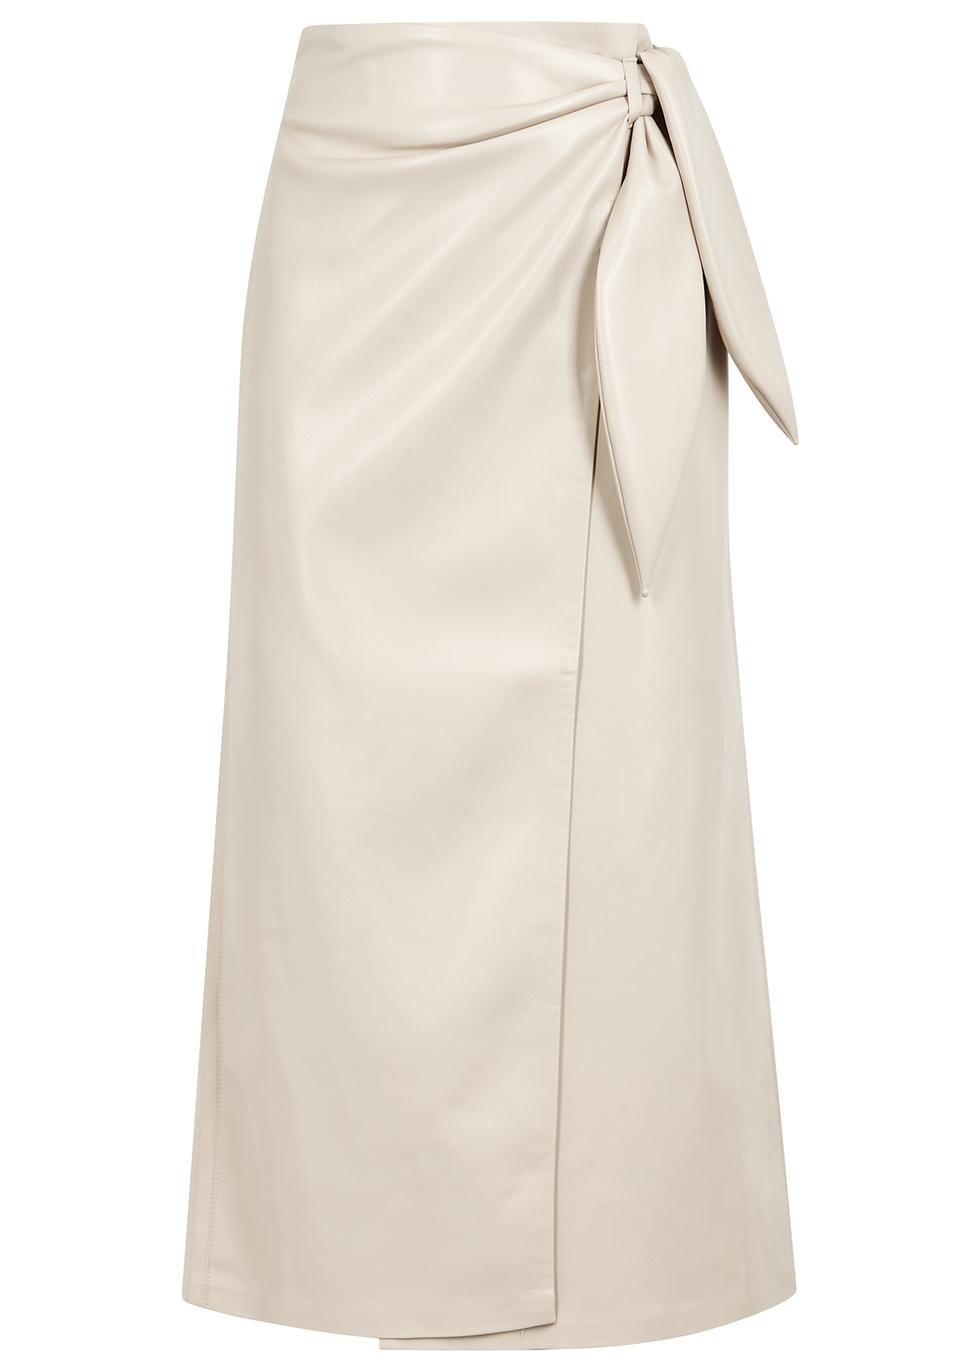 0361aae52fff Women's Designer Skirts - Harvey Nichols